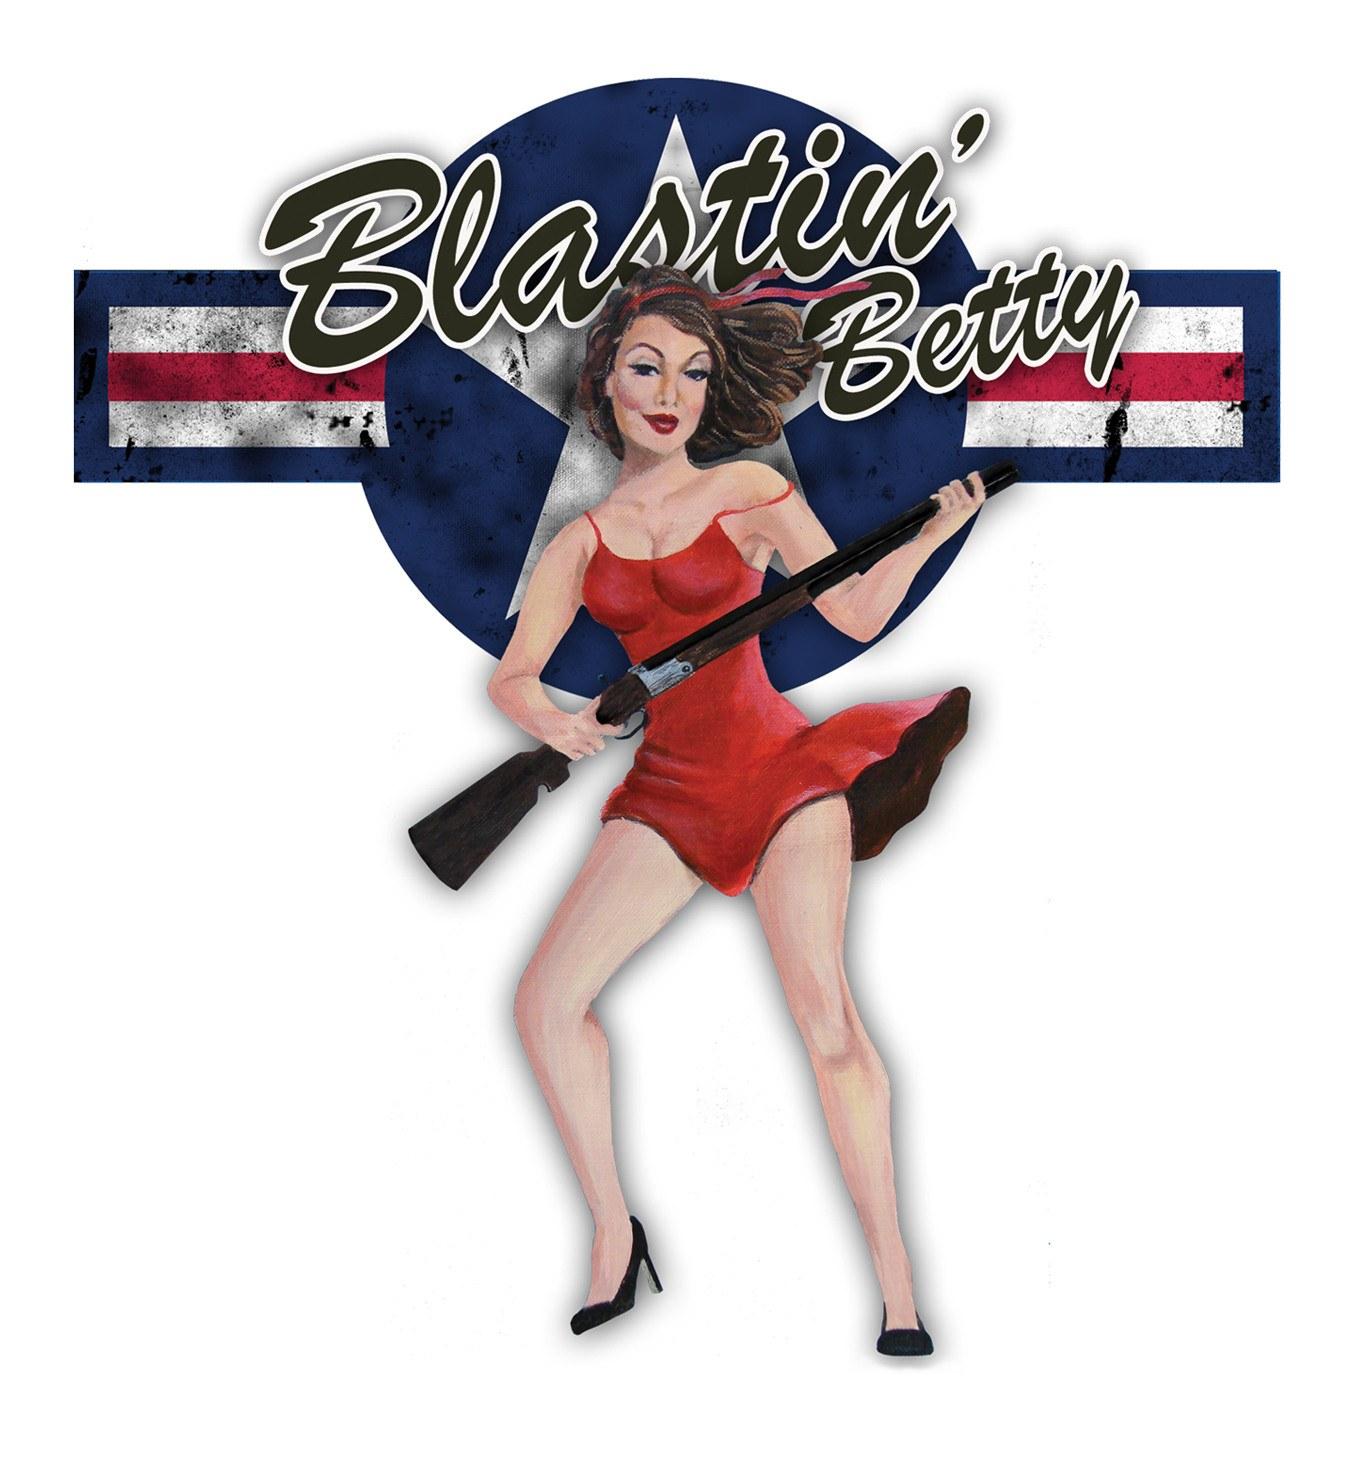 Blastin' Betty